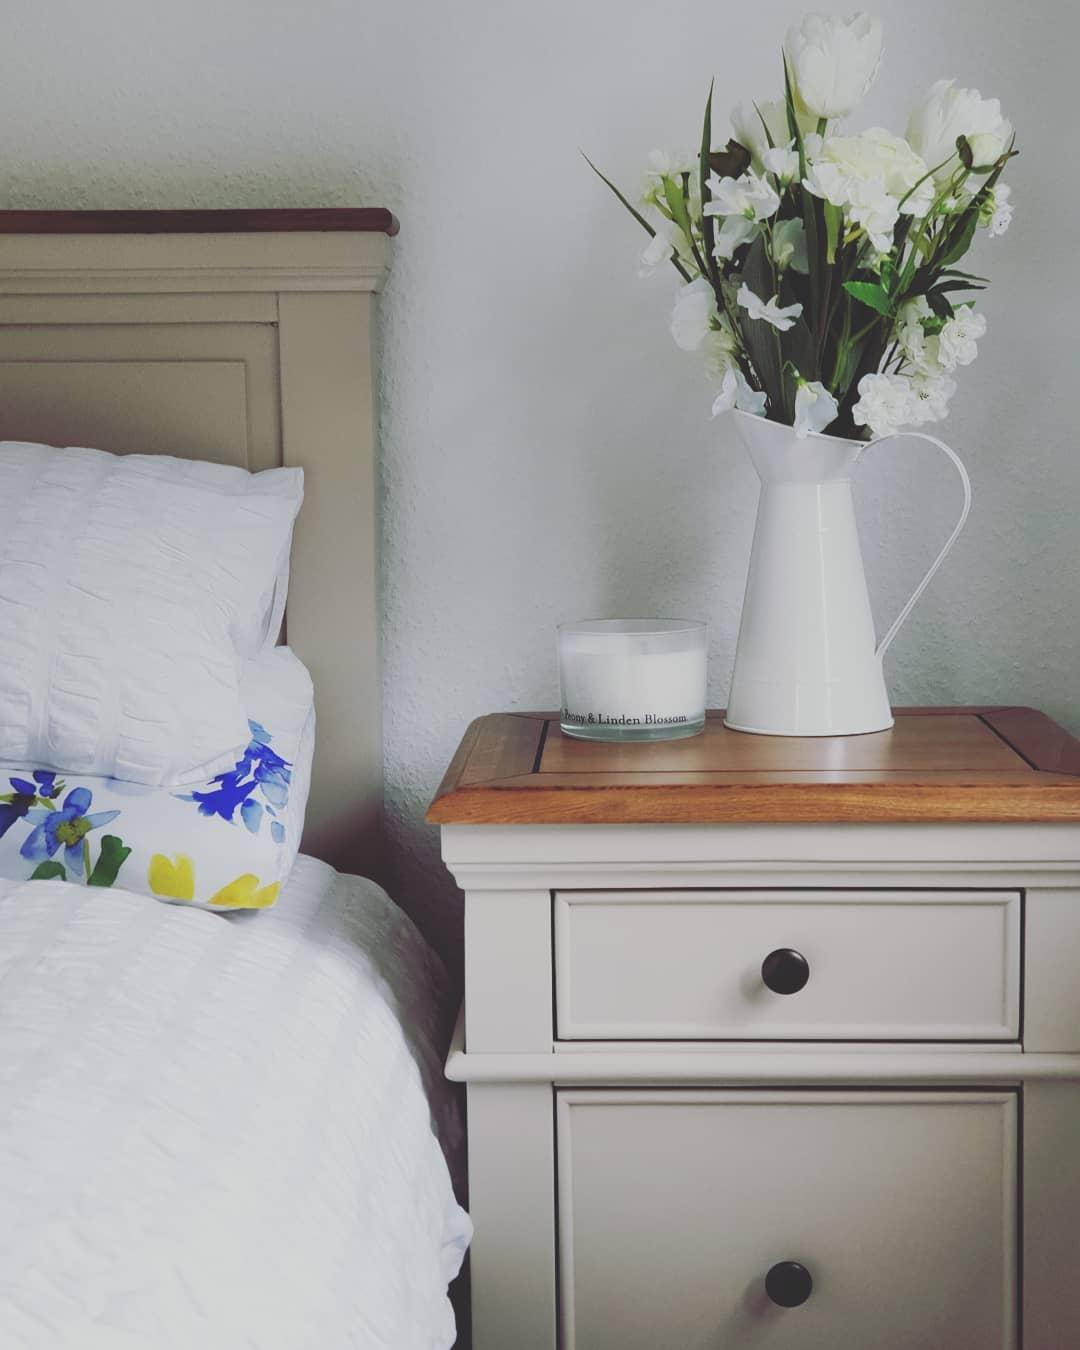 White furniture, white roses in a vase